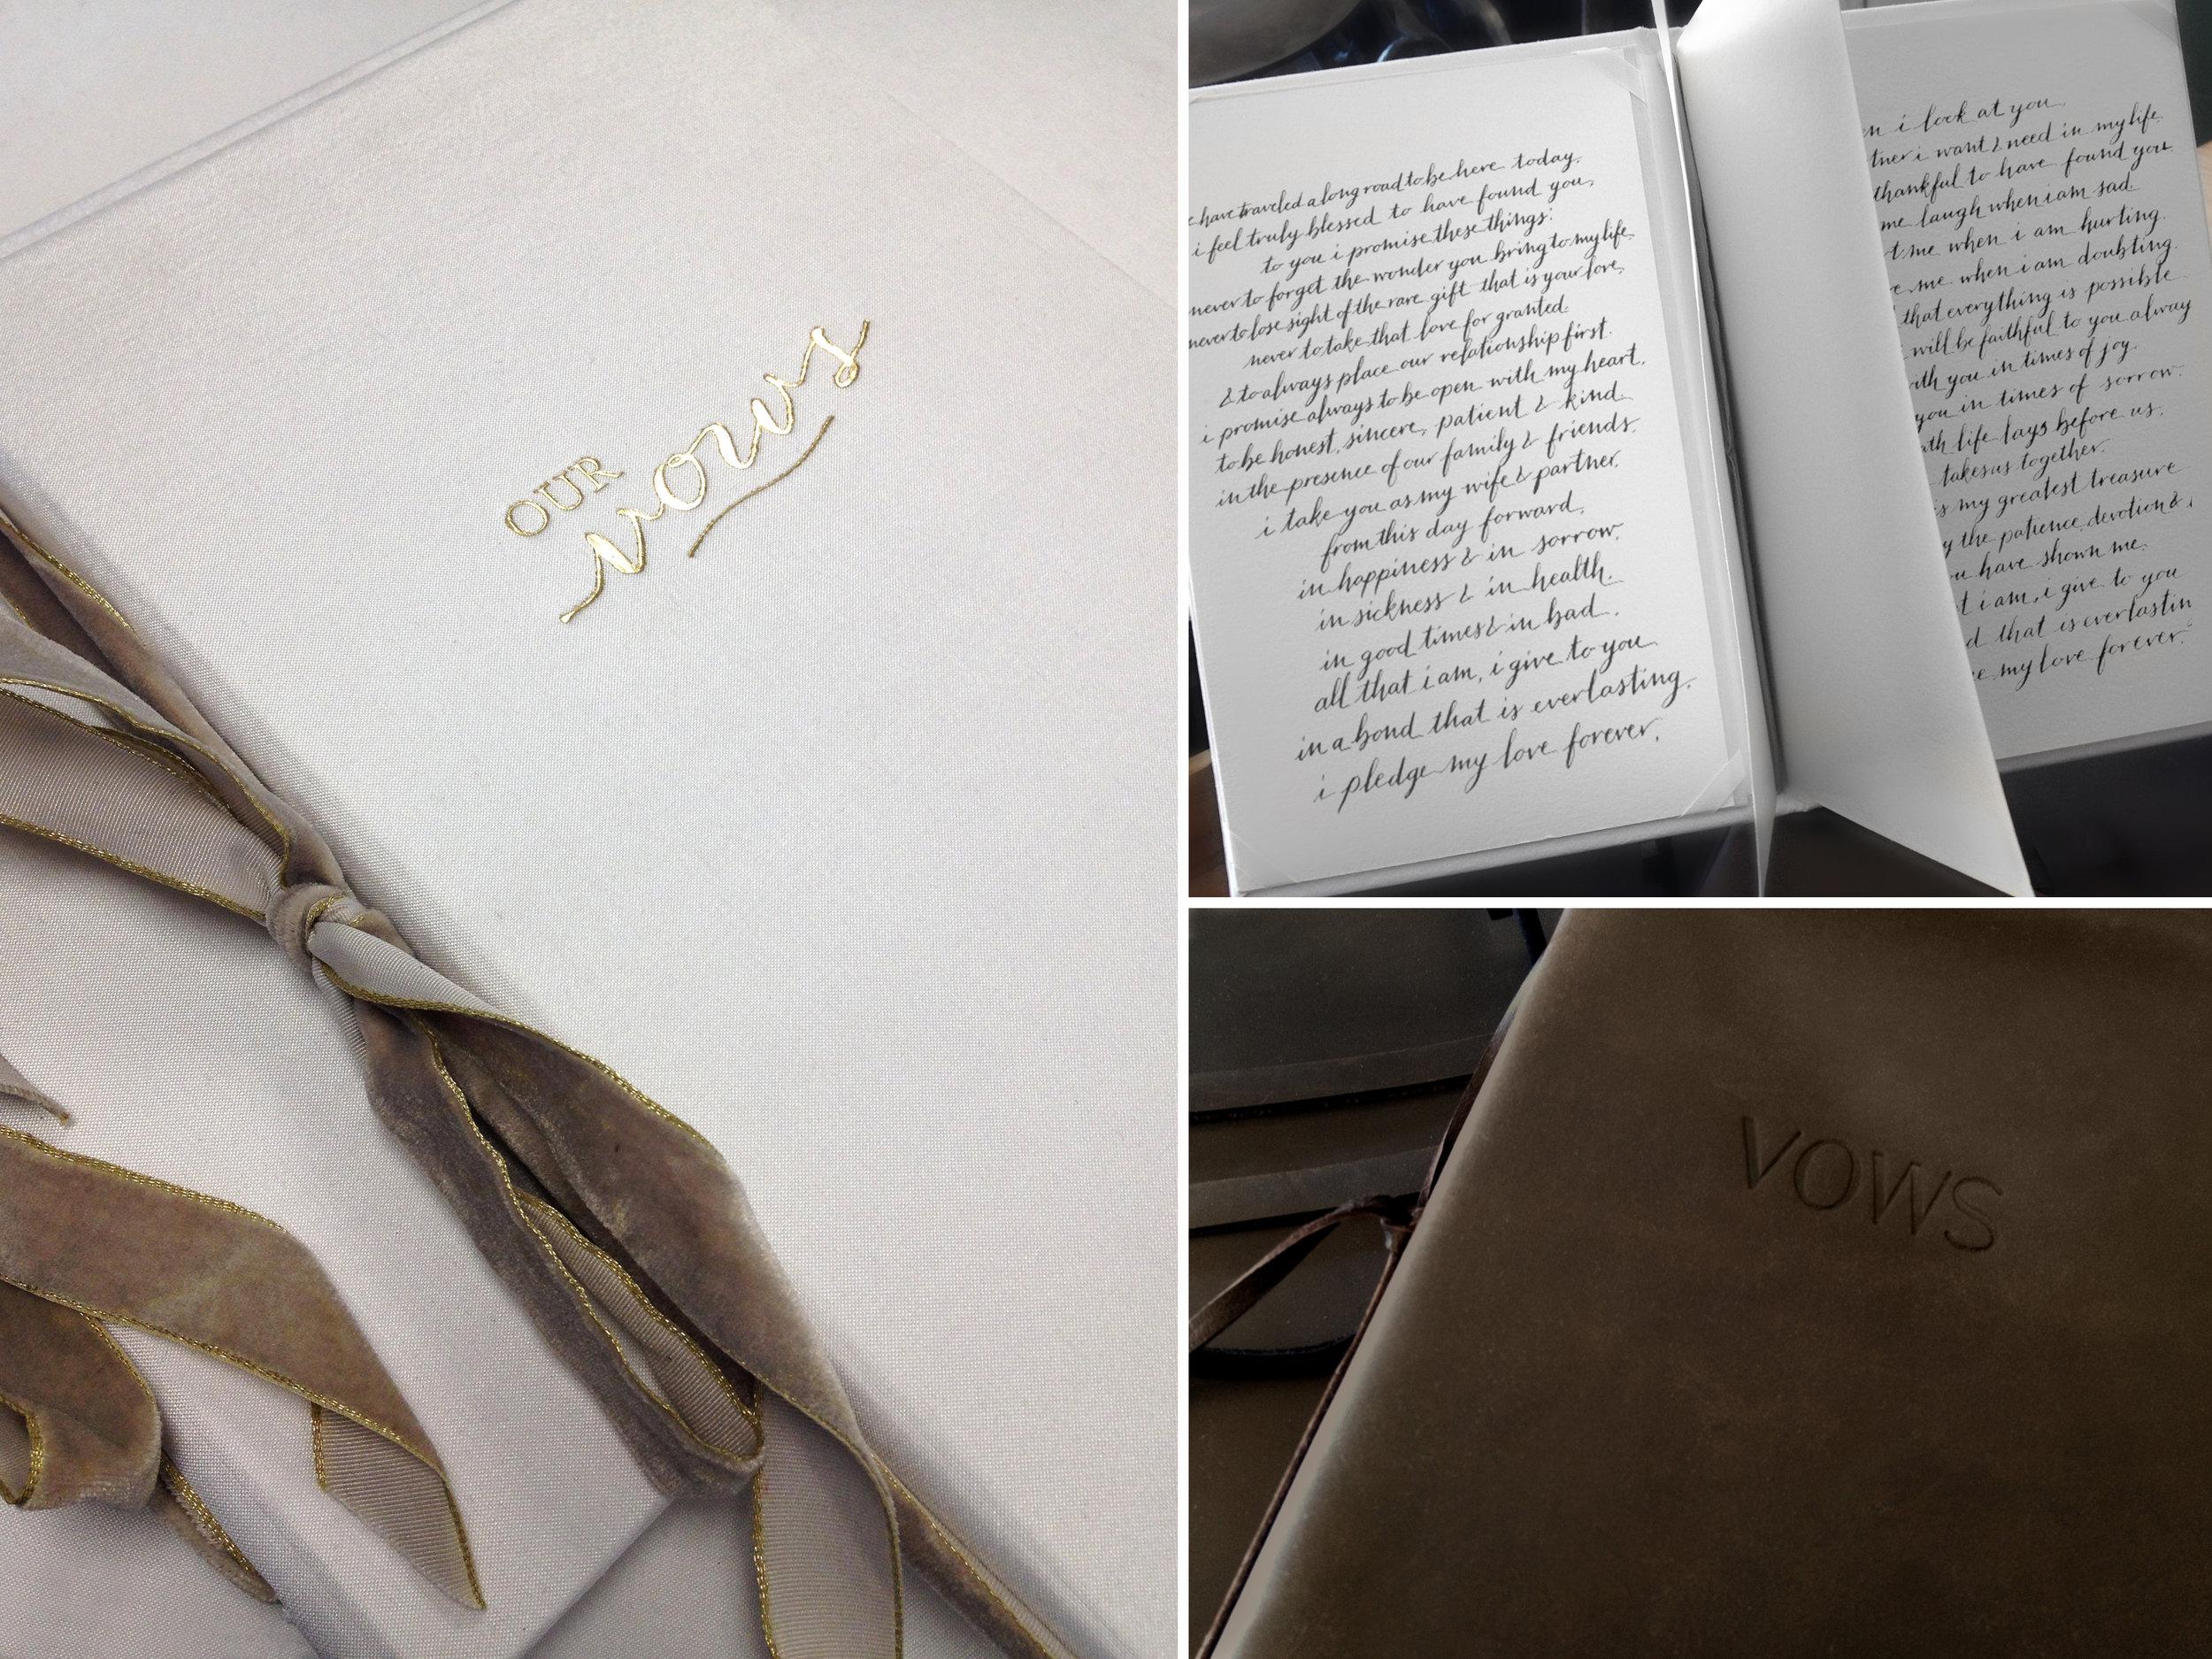 vows-book-custom-handmade-caligraphy-leather-wedding.jpg